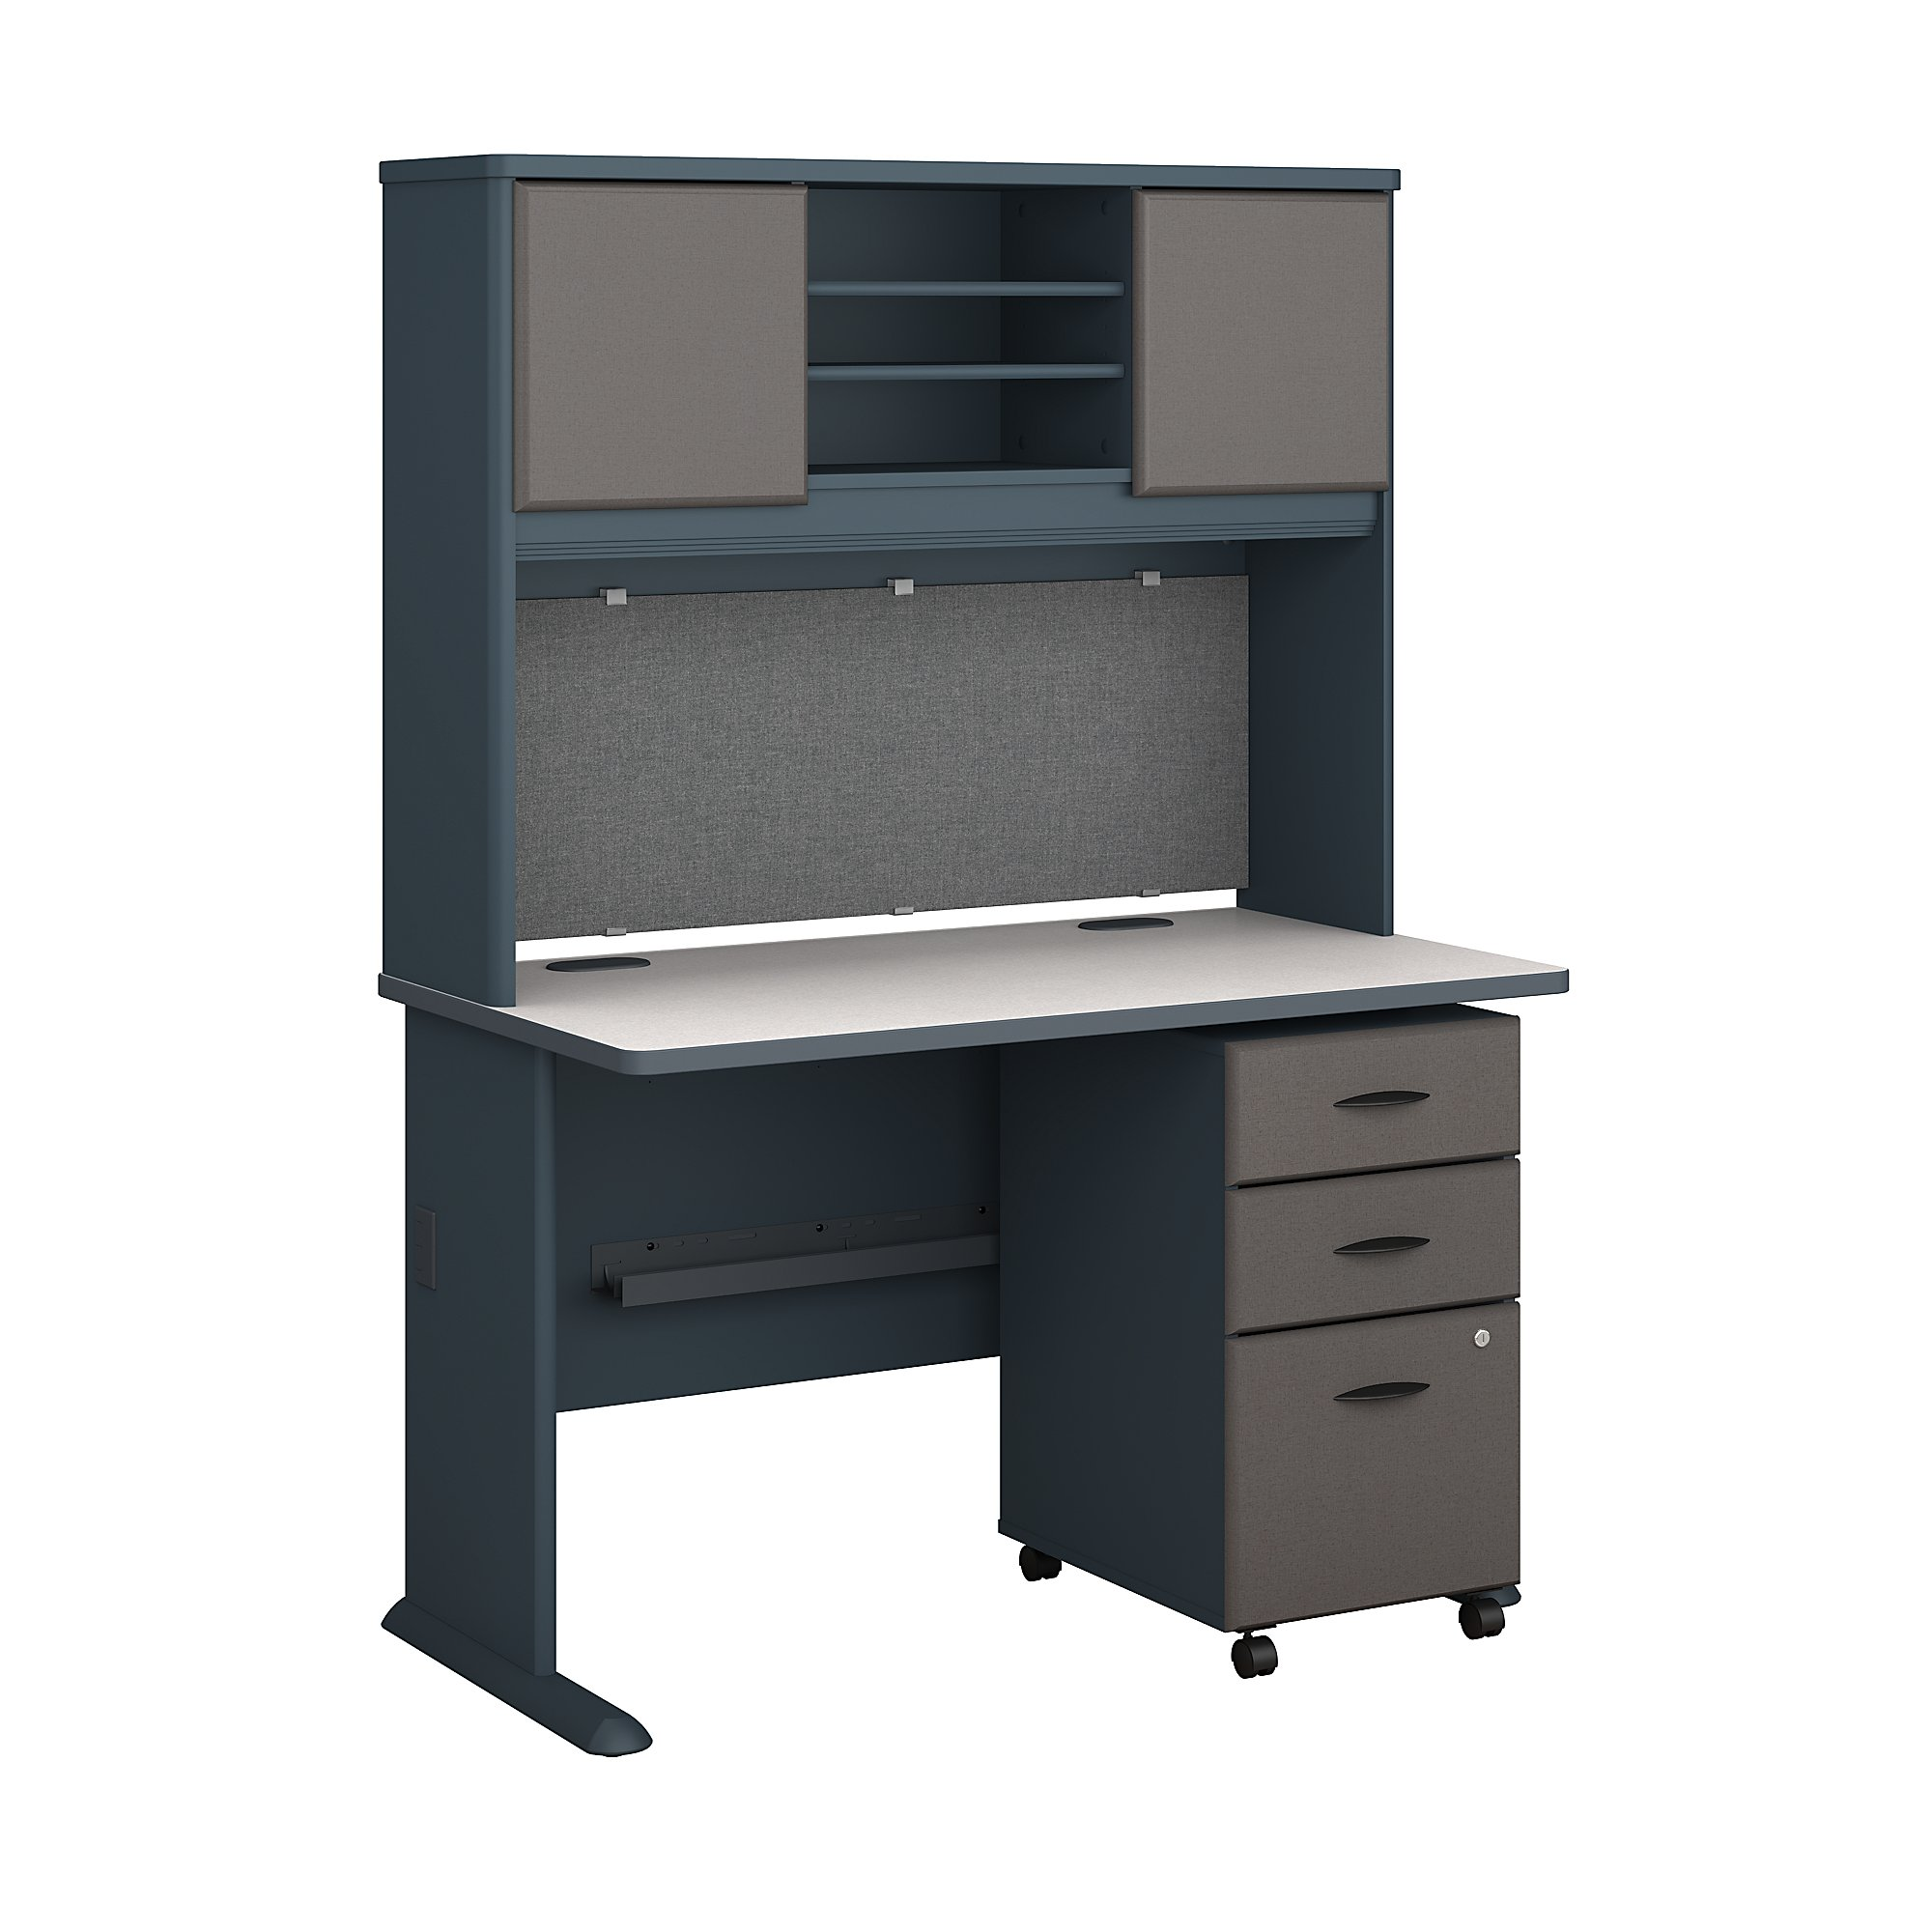 Series a returns bundles 254 lbs weight capacity engineered wood 48 w desk hutch 3 drawer mobile pedestal walmart com